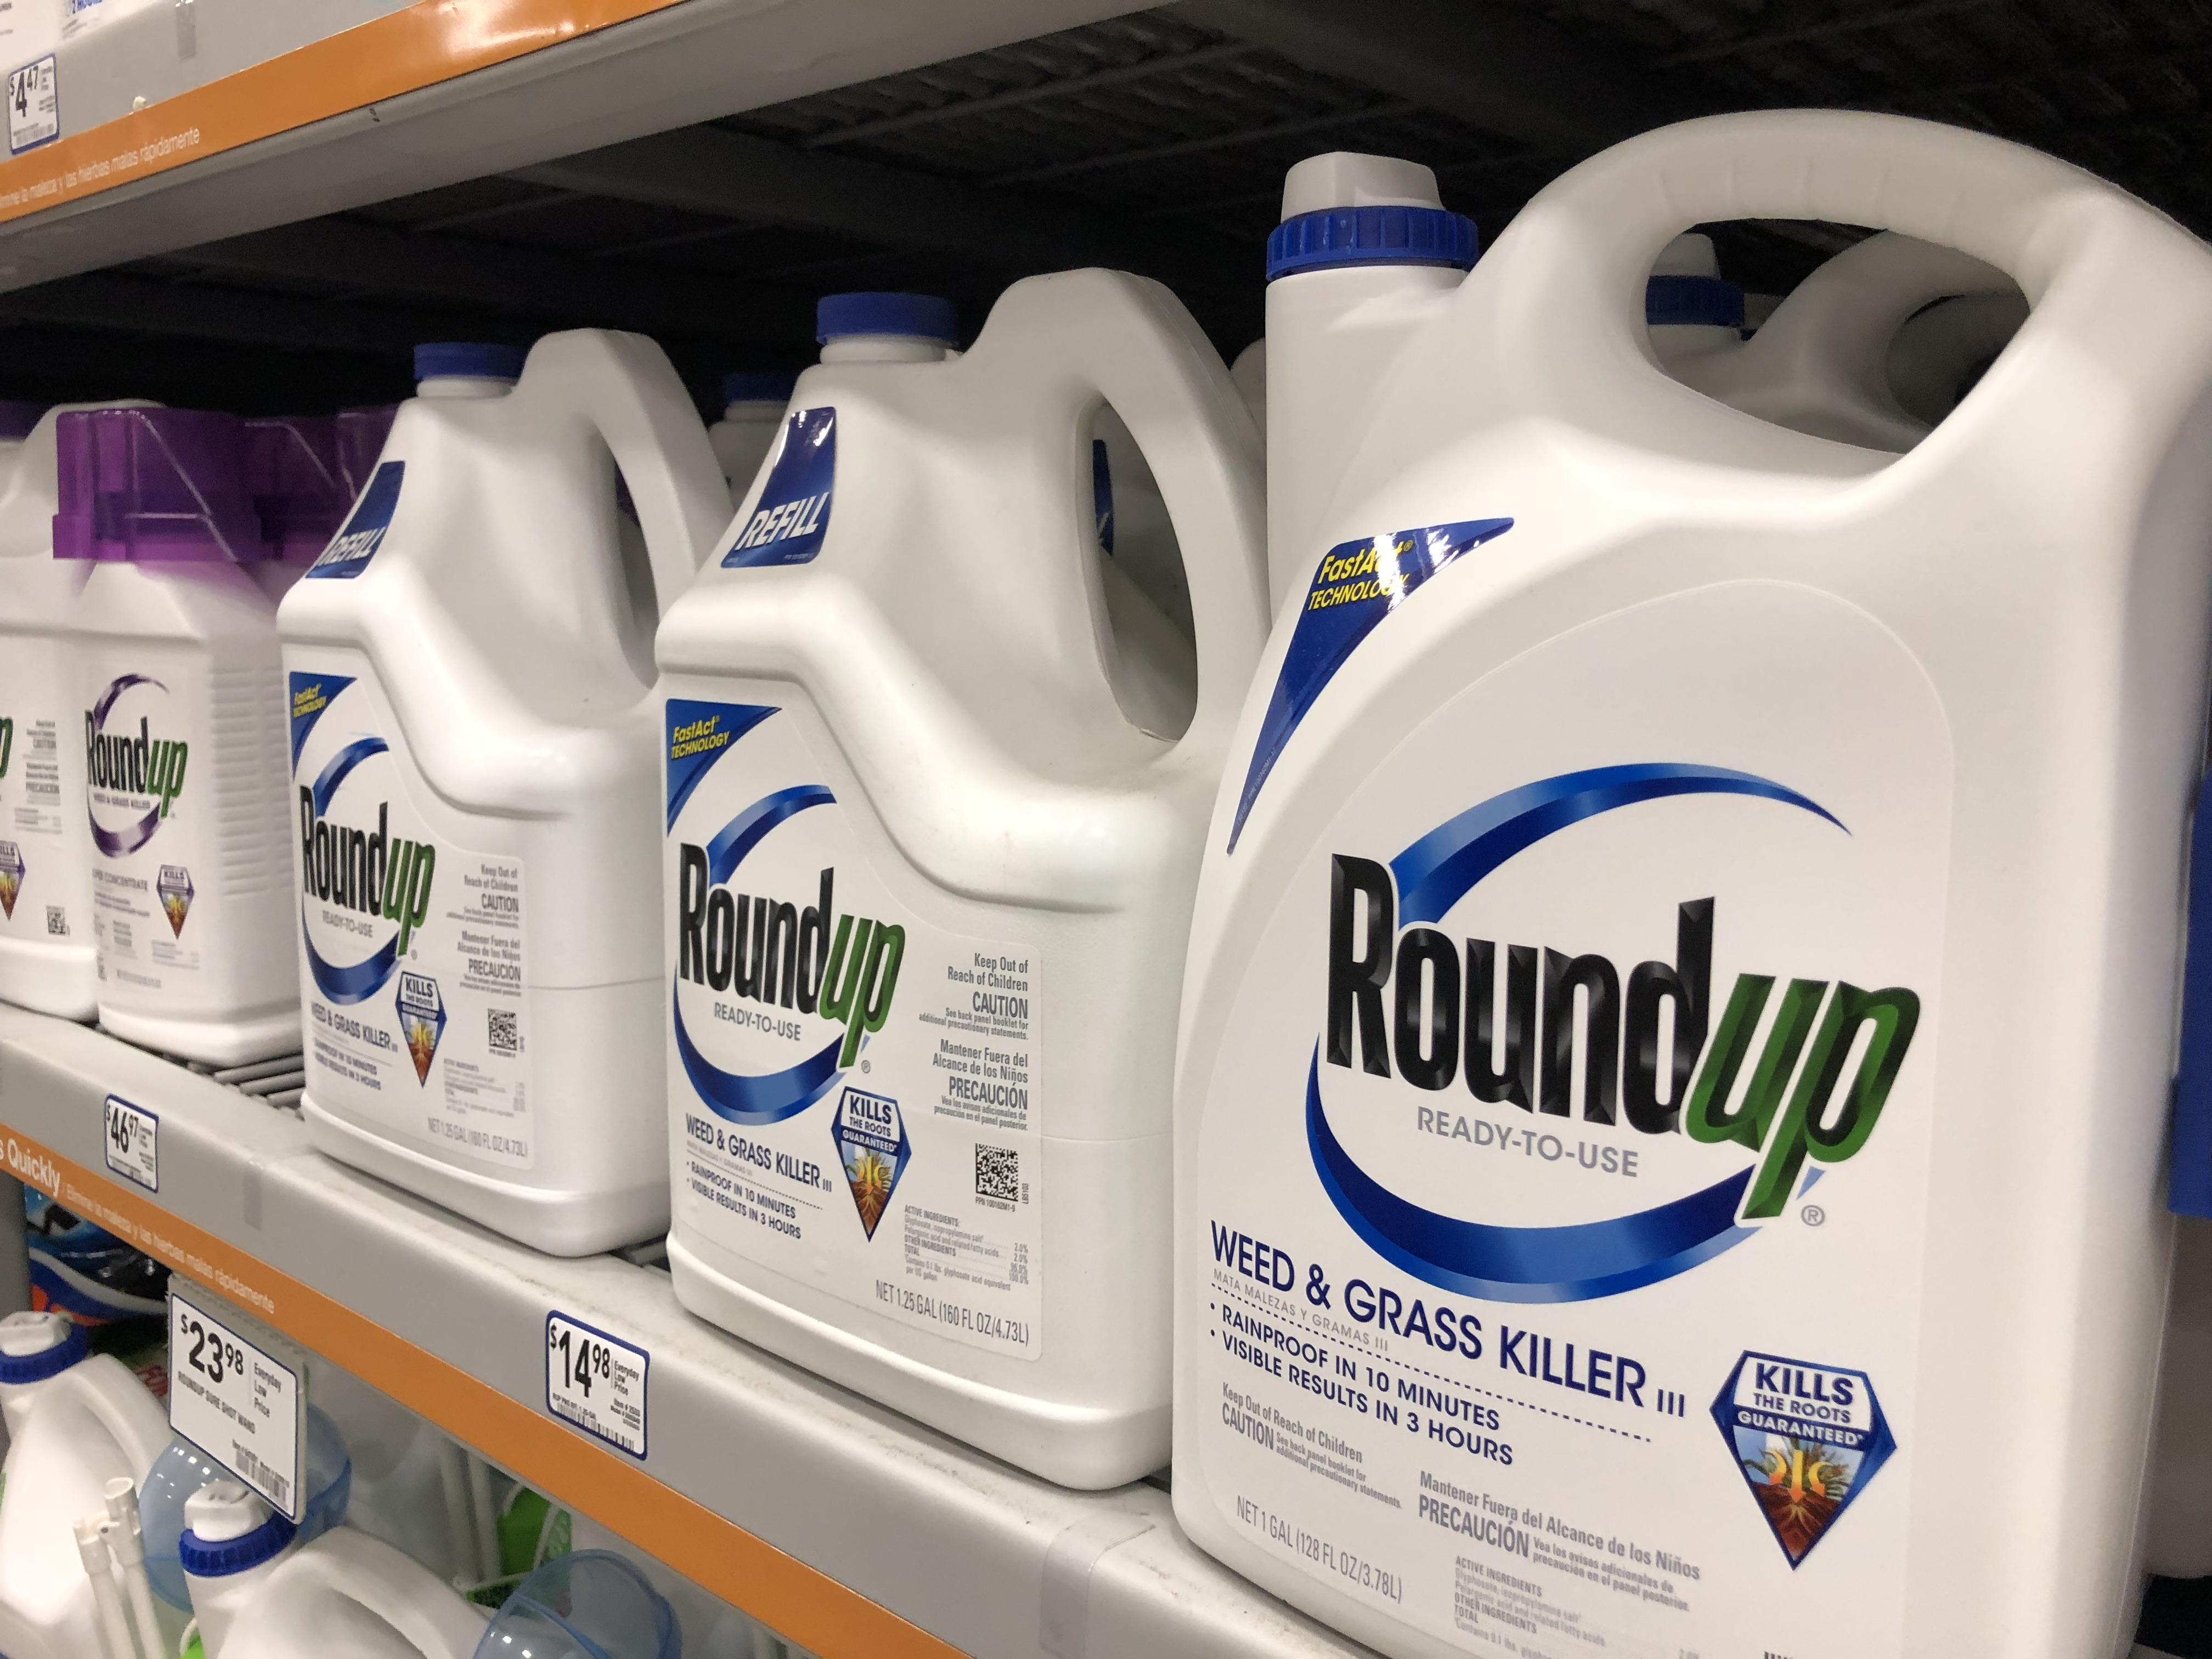 Roundup on shelf